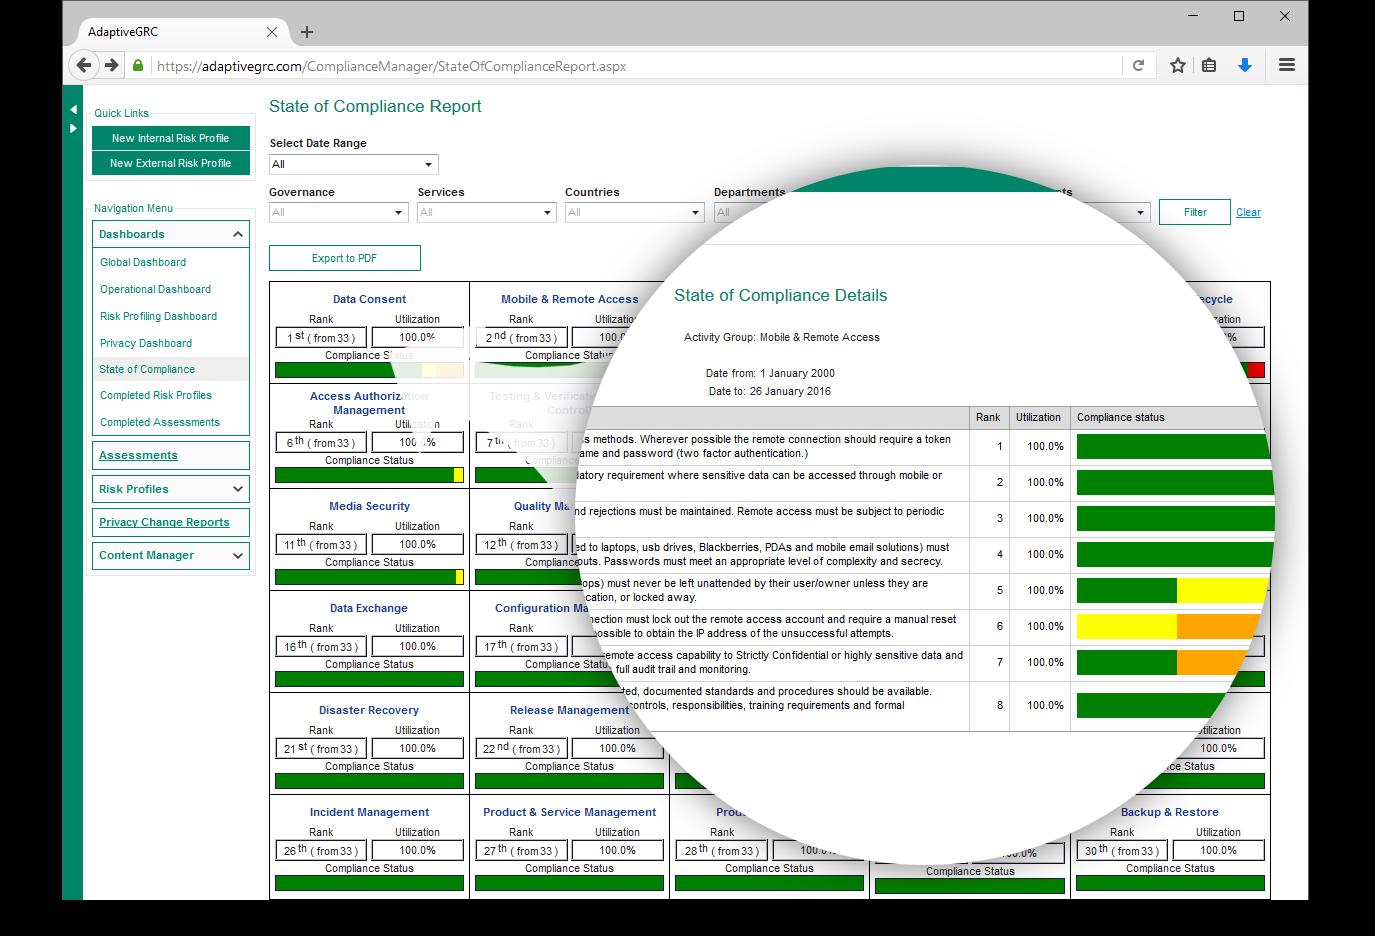 AdaptiveGRC Compliance Manager